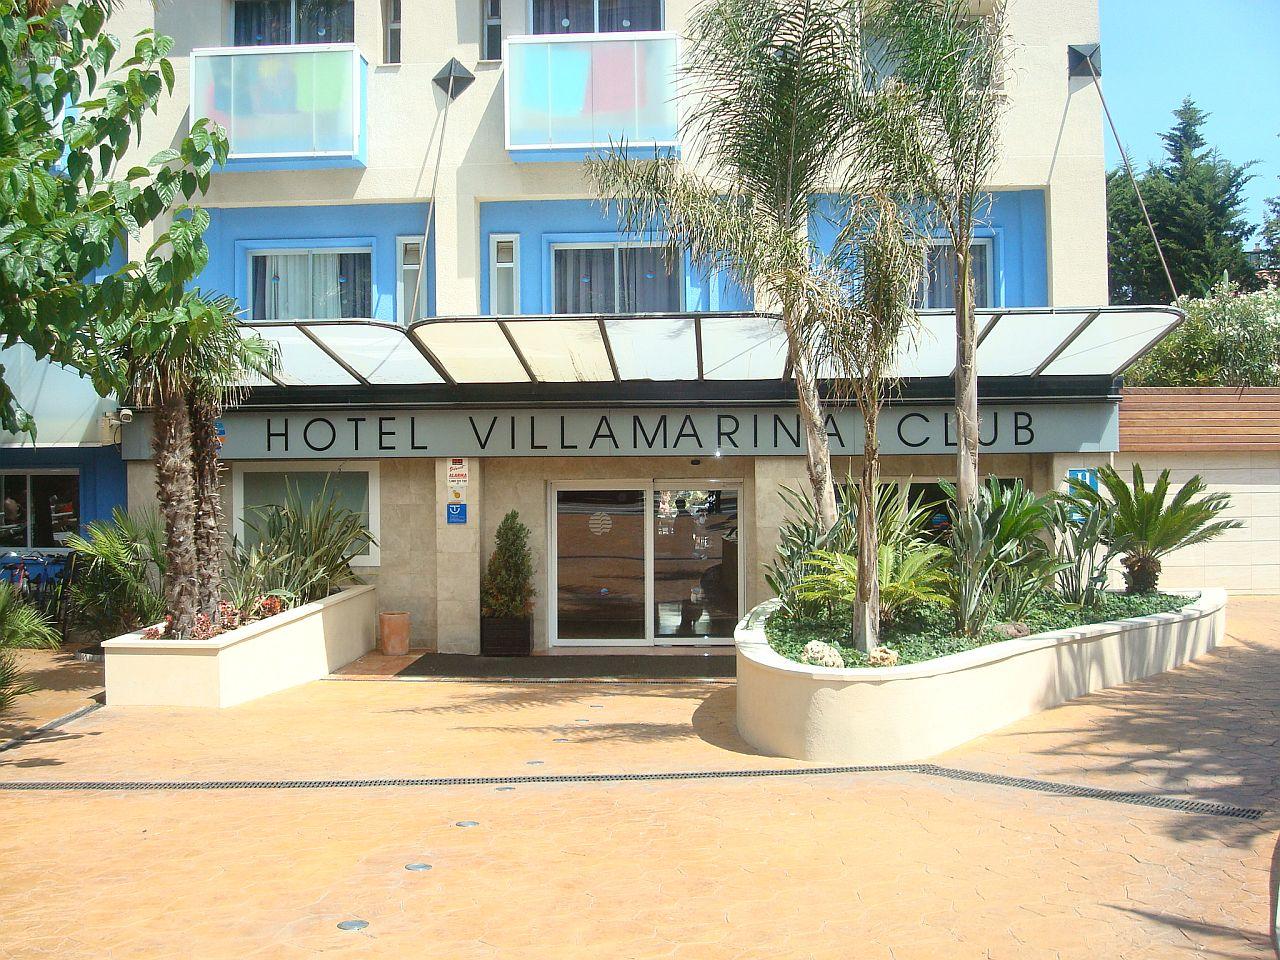 Villamarina Club (hotel)